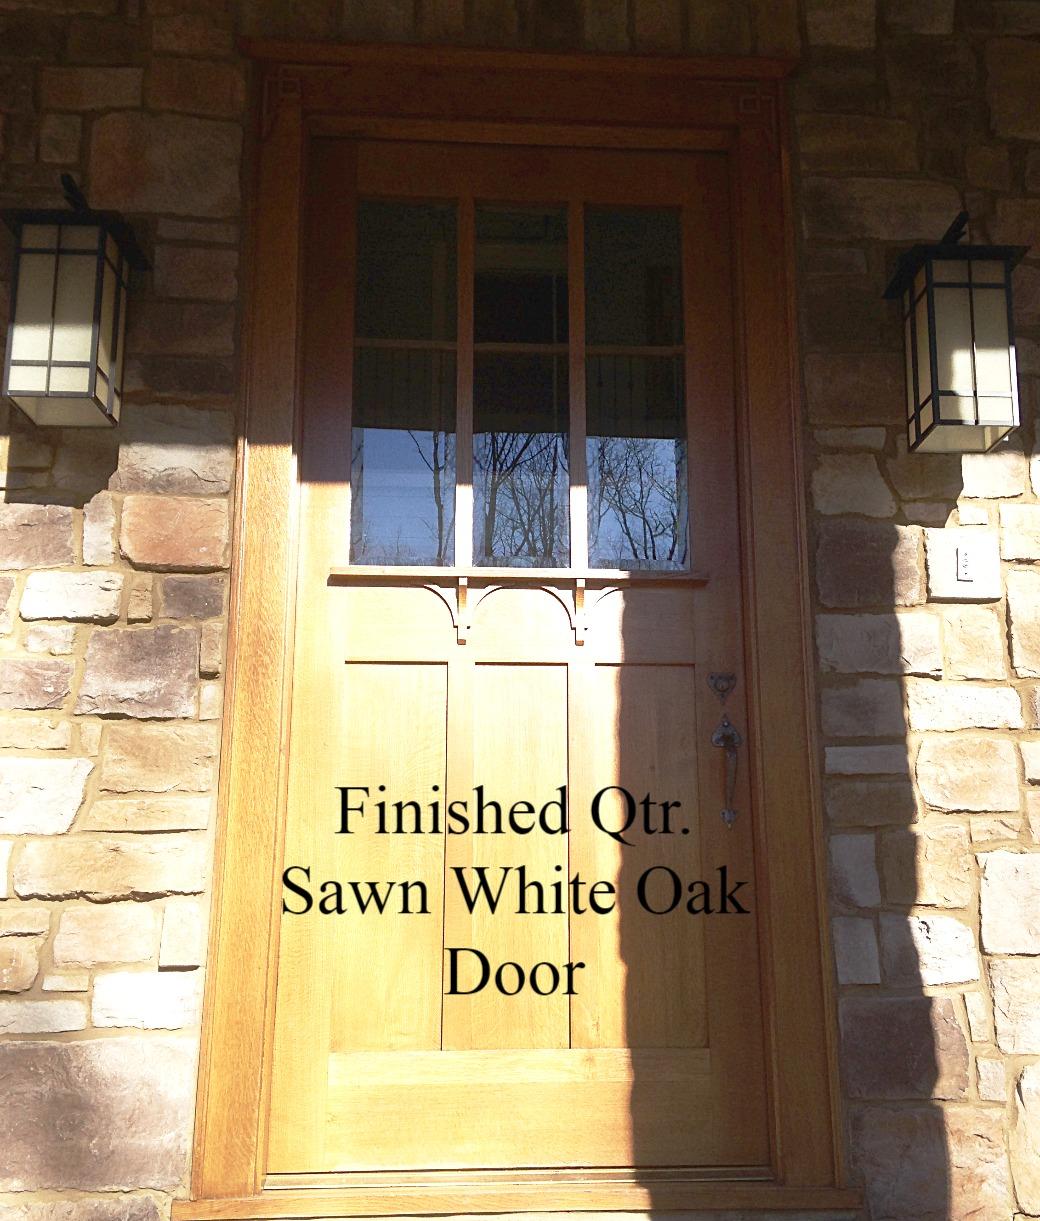 Qtr. Sawn White Oak Door